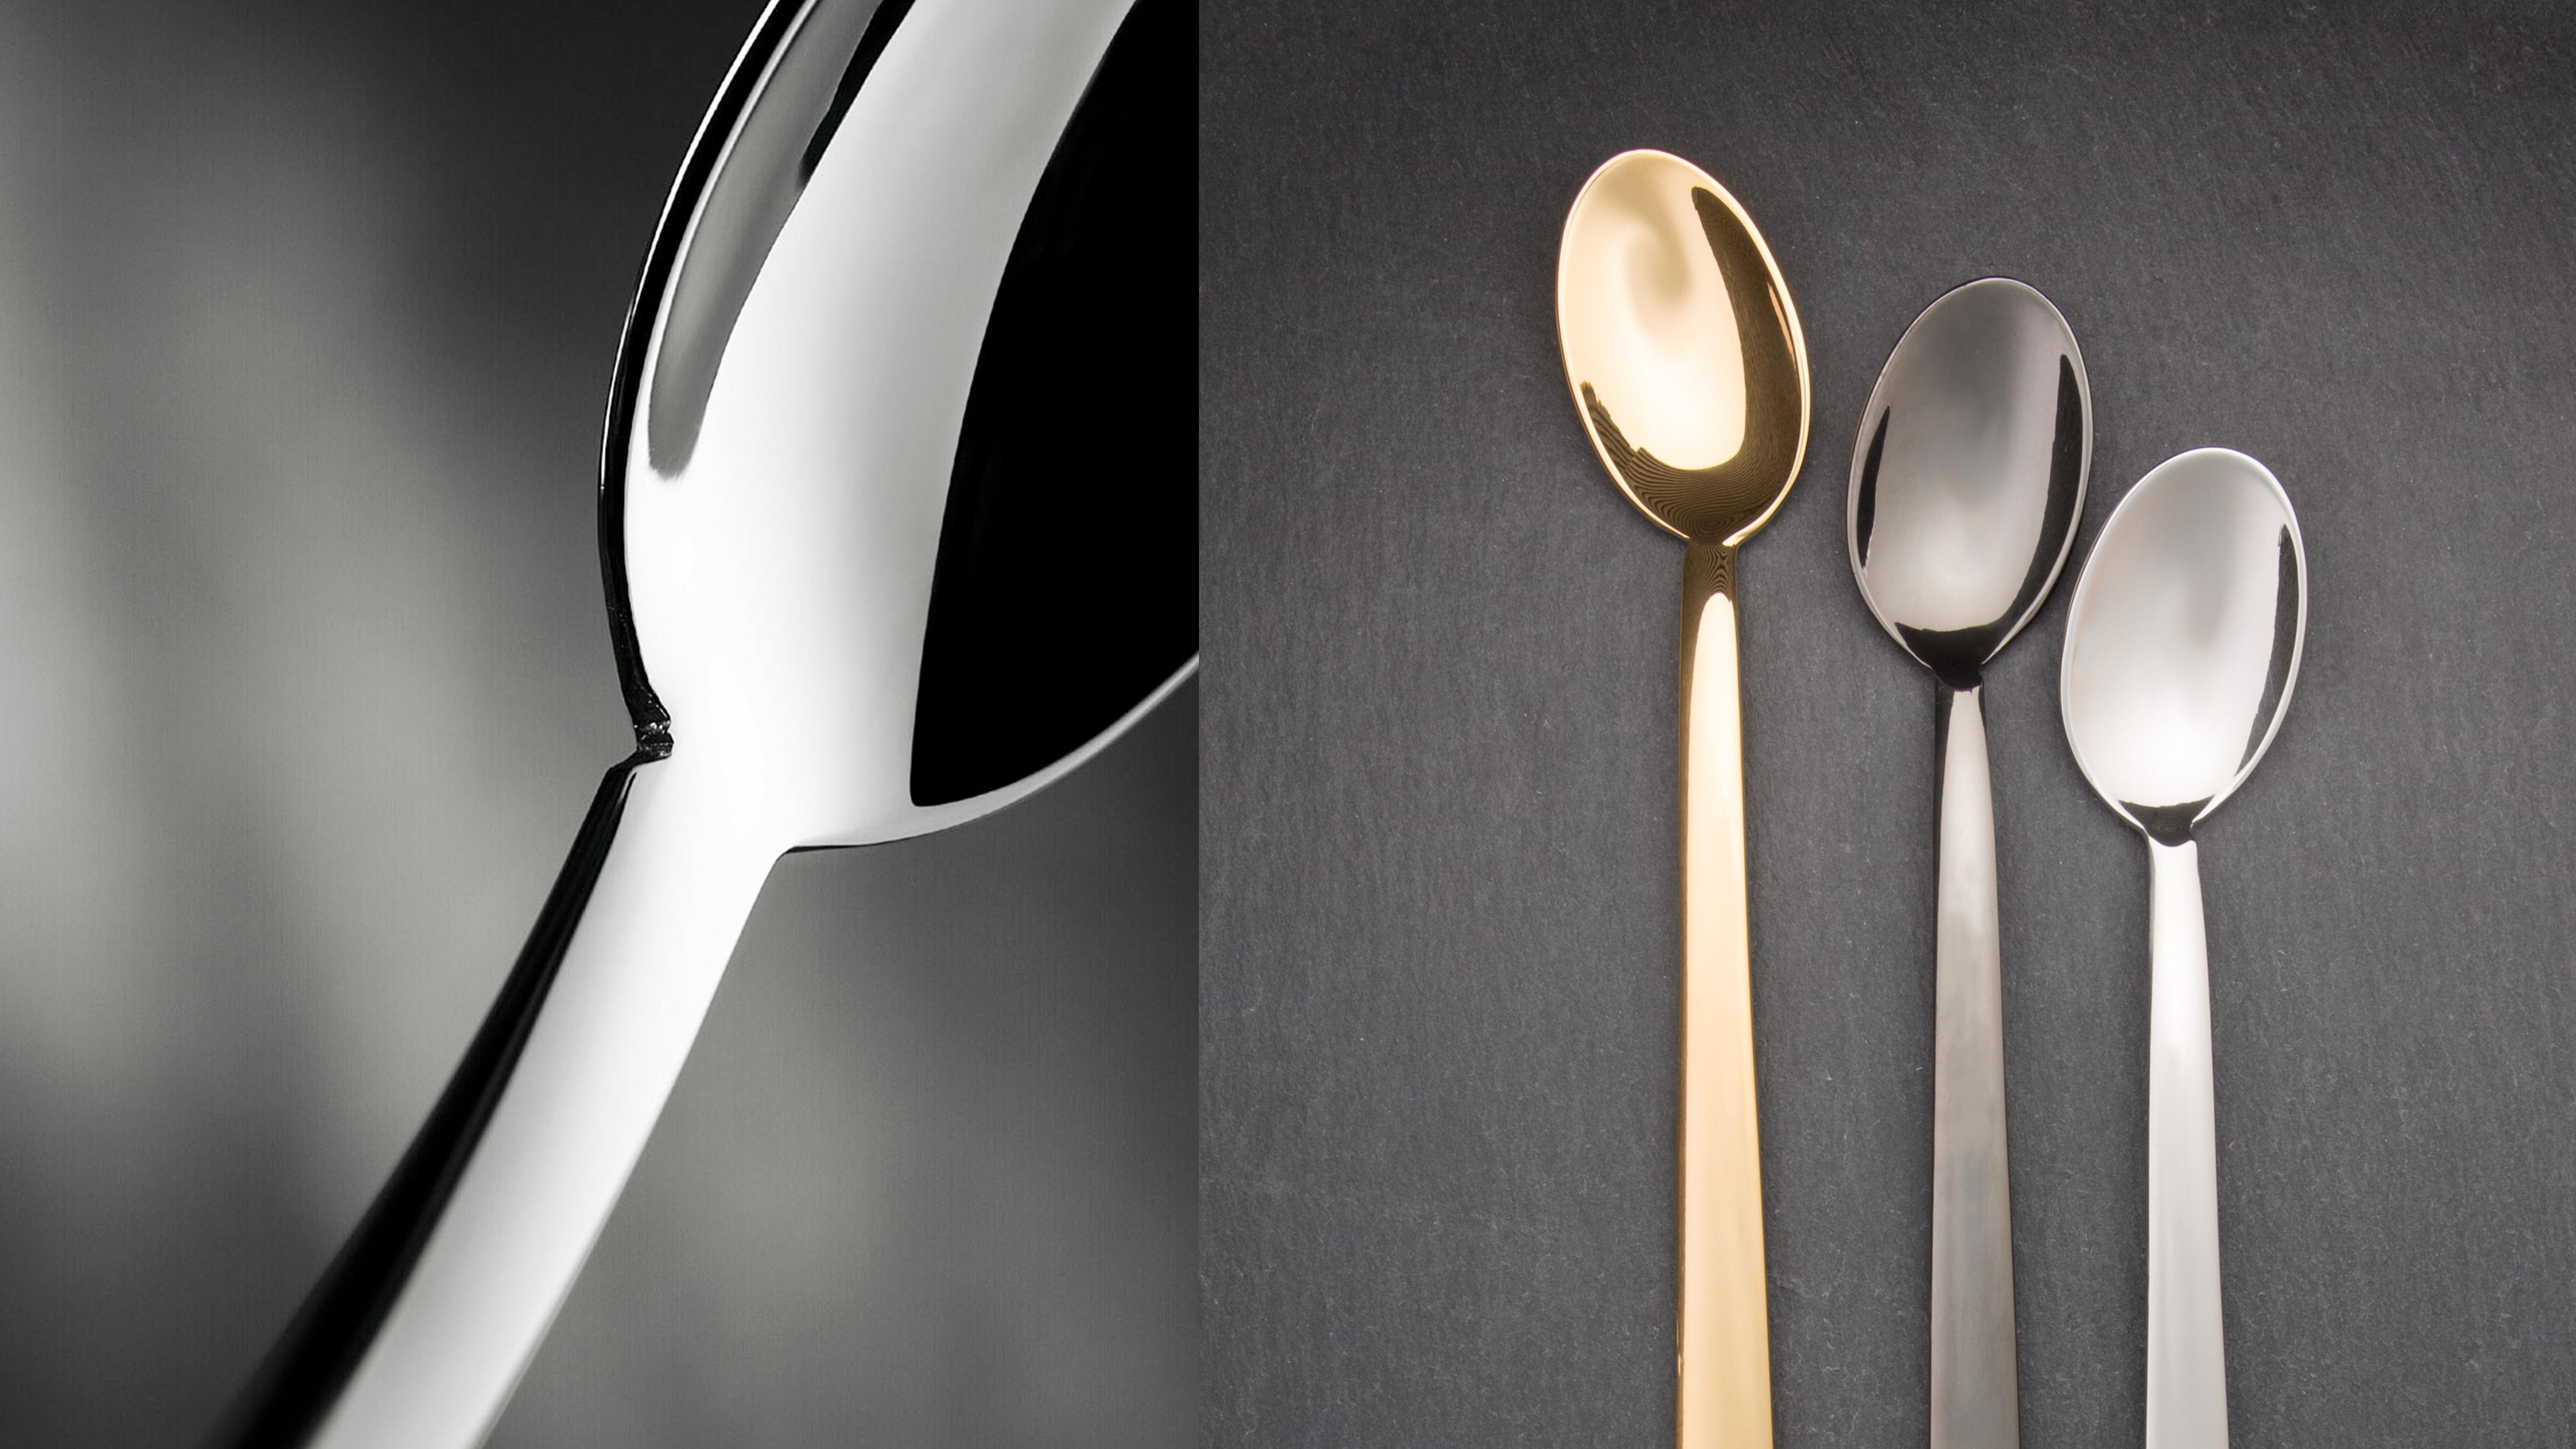 Spoons from Moonlashes   © Alexander Bayer / Faruk Pinjo